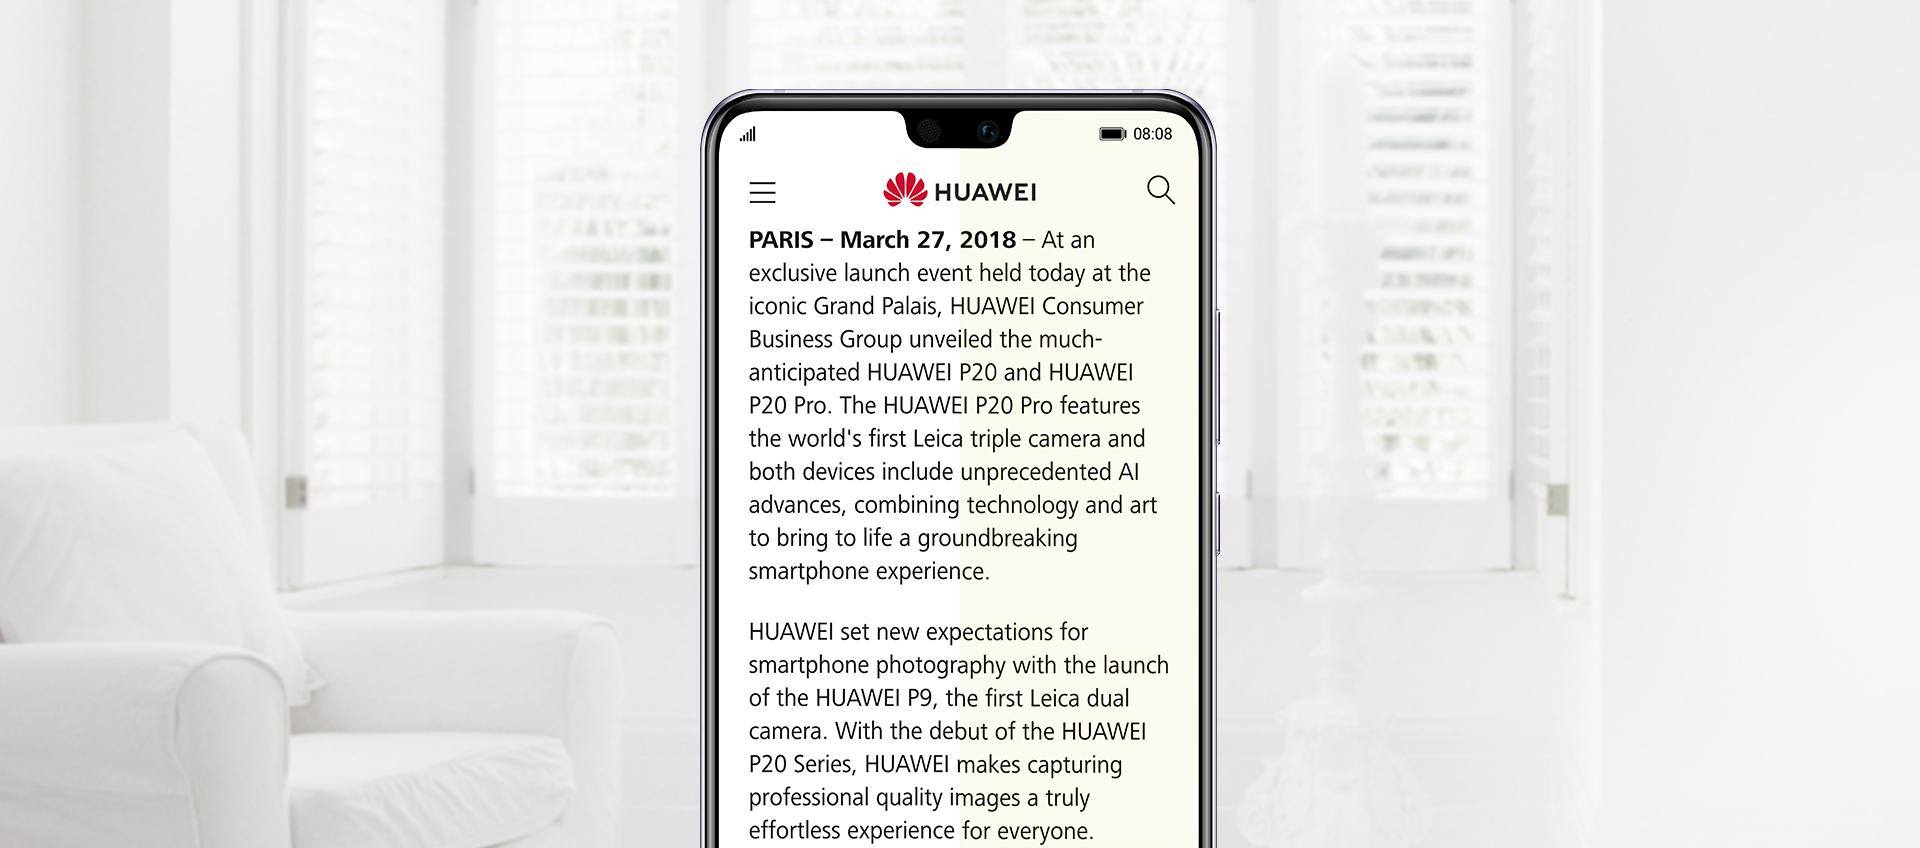 https://consumer-img.huawei.com/content/dam/huawei-cbg-site/common/mkt/pdp/phones/p20-pro-update1/img/design/huawei-p20-pro-natural-tone-display-original.jpg